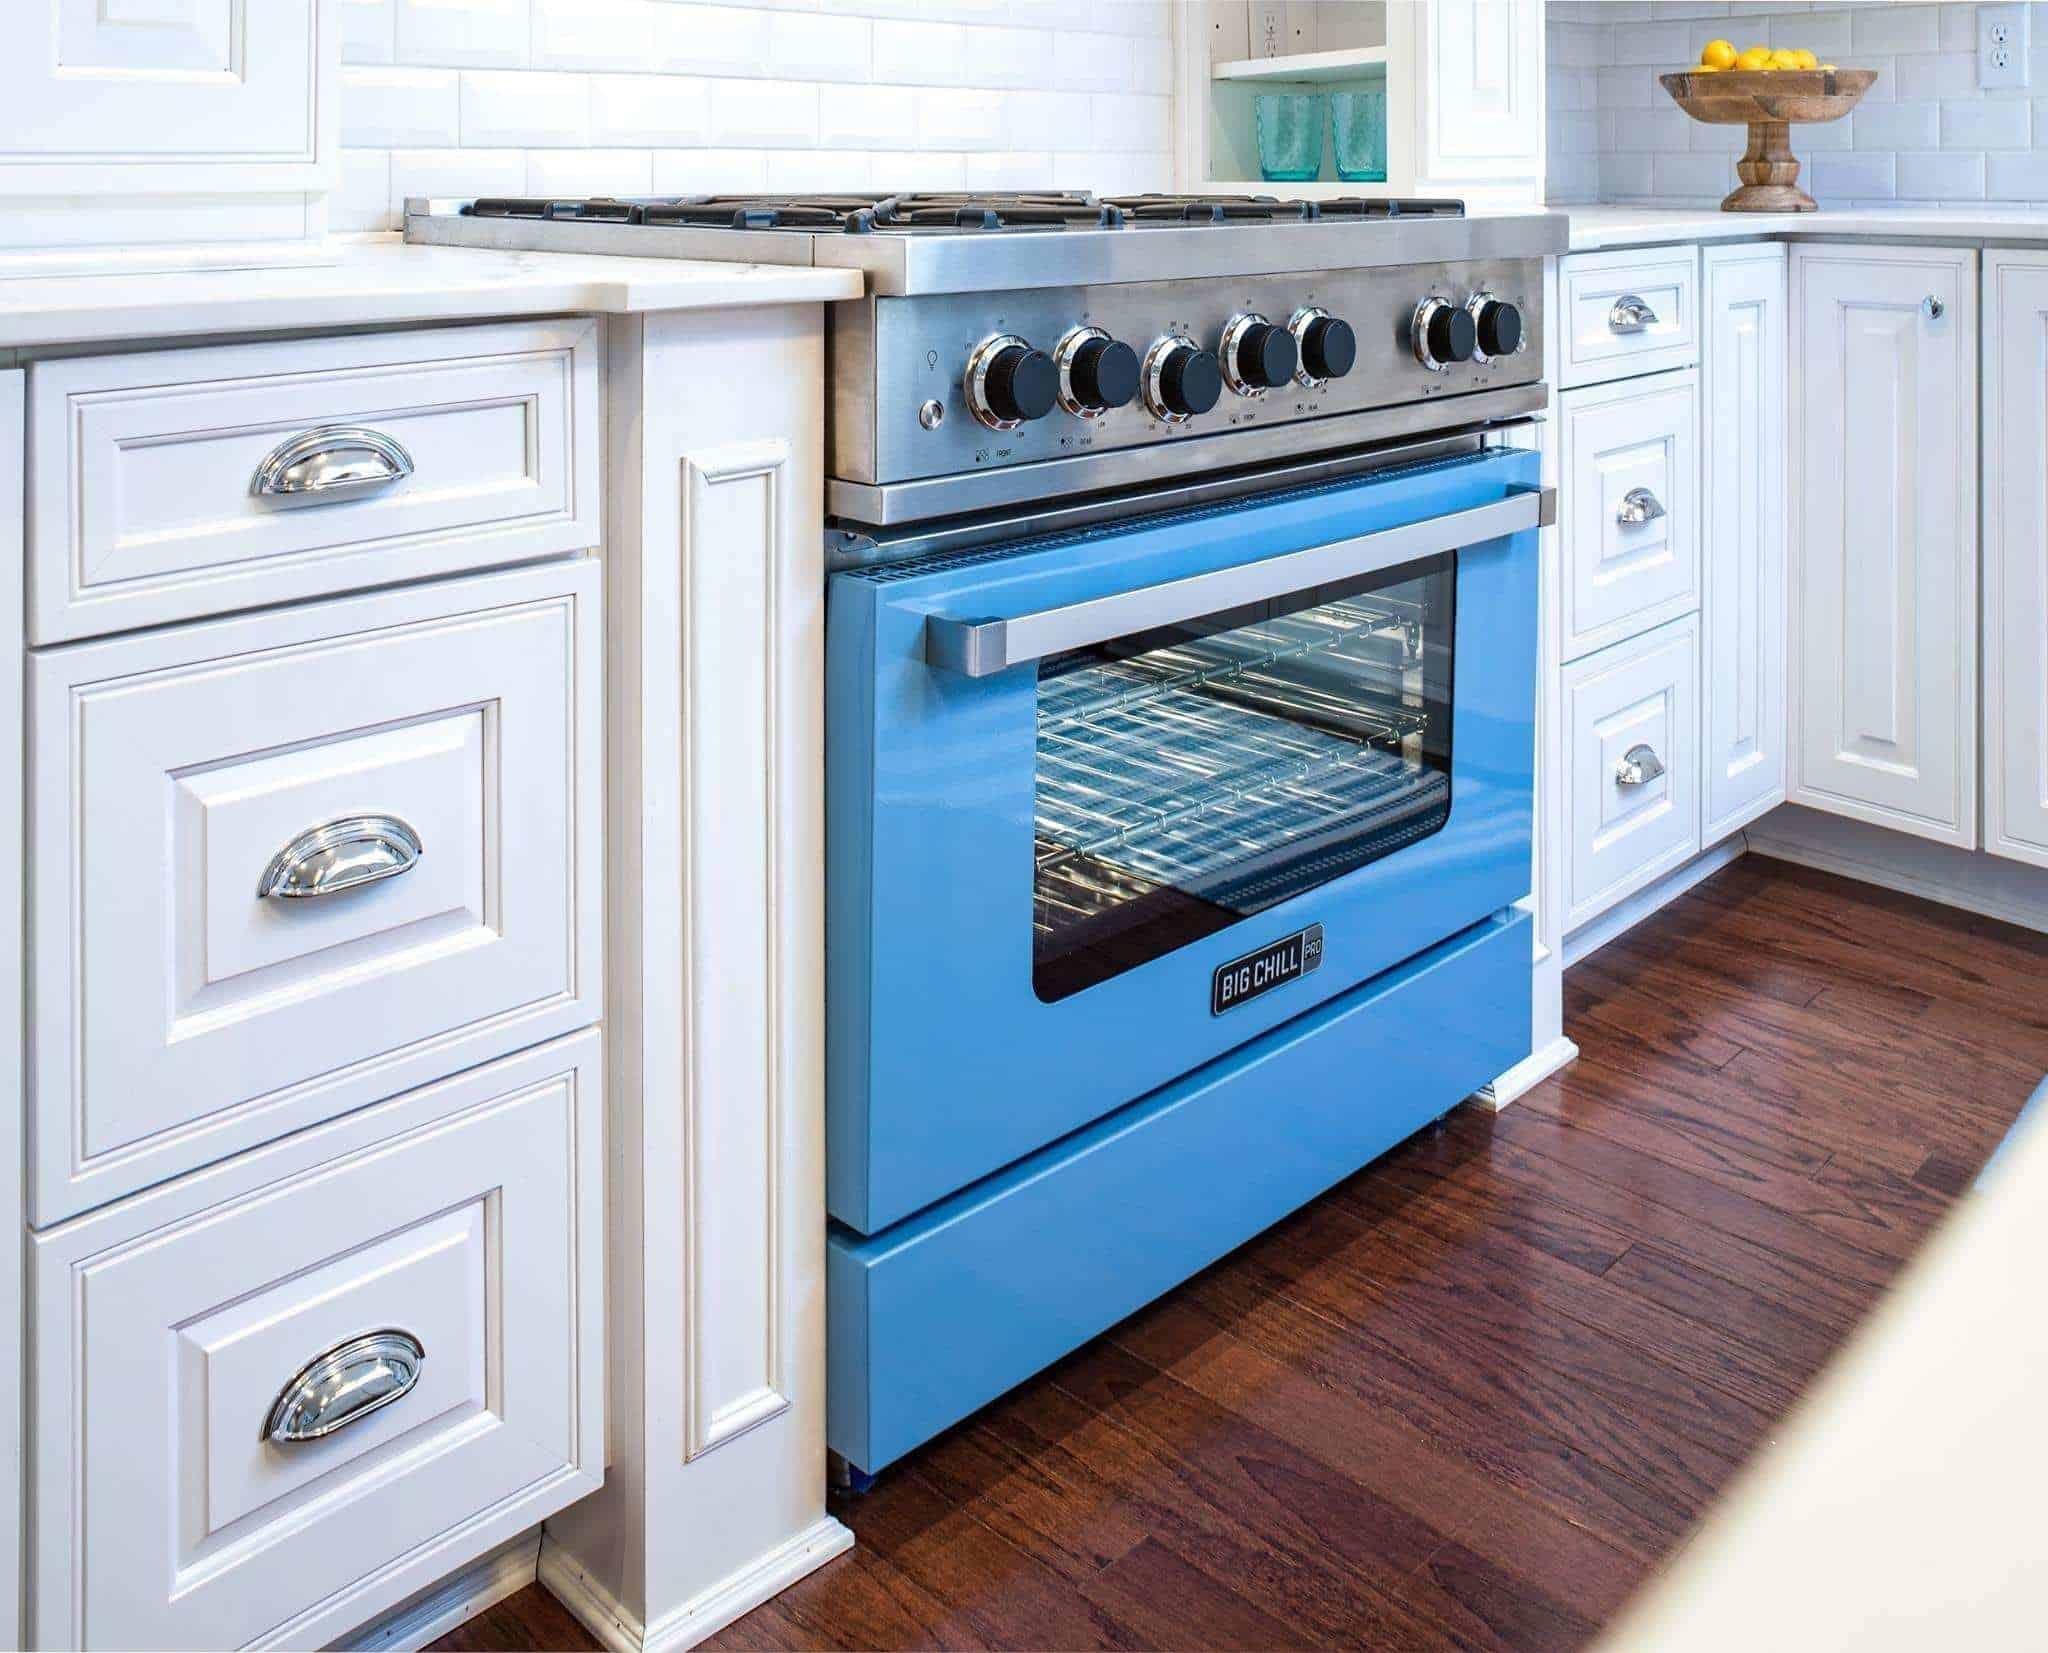 retro kitchen appliances Beautiful Big Chill Appliances home Pinterest